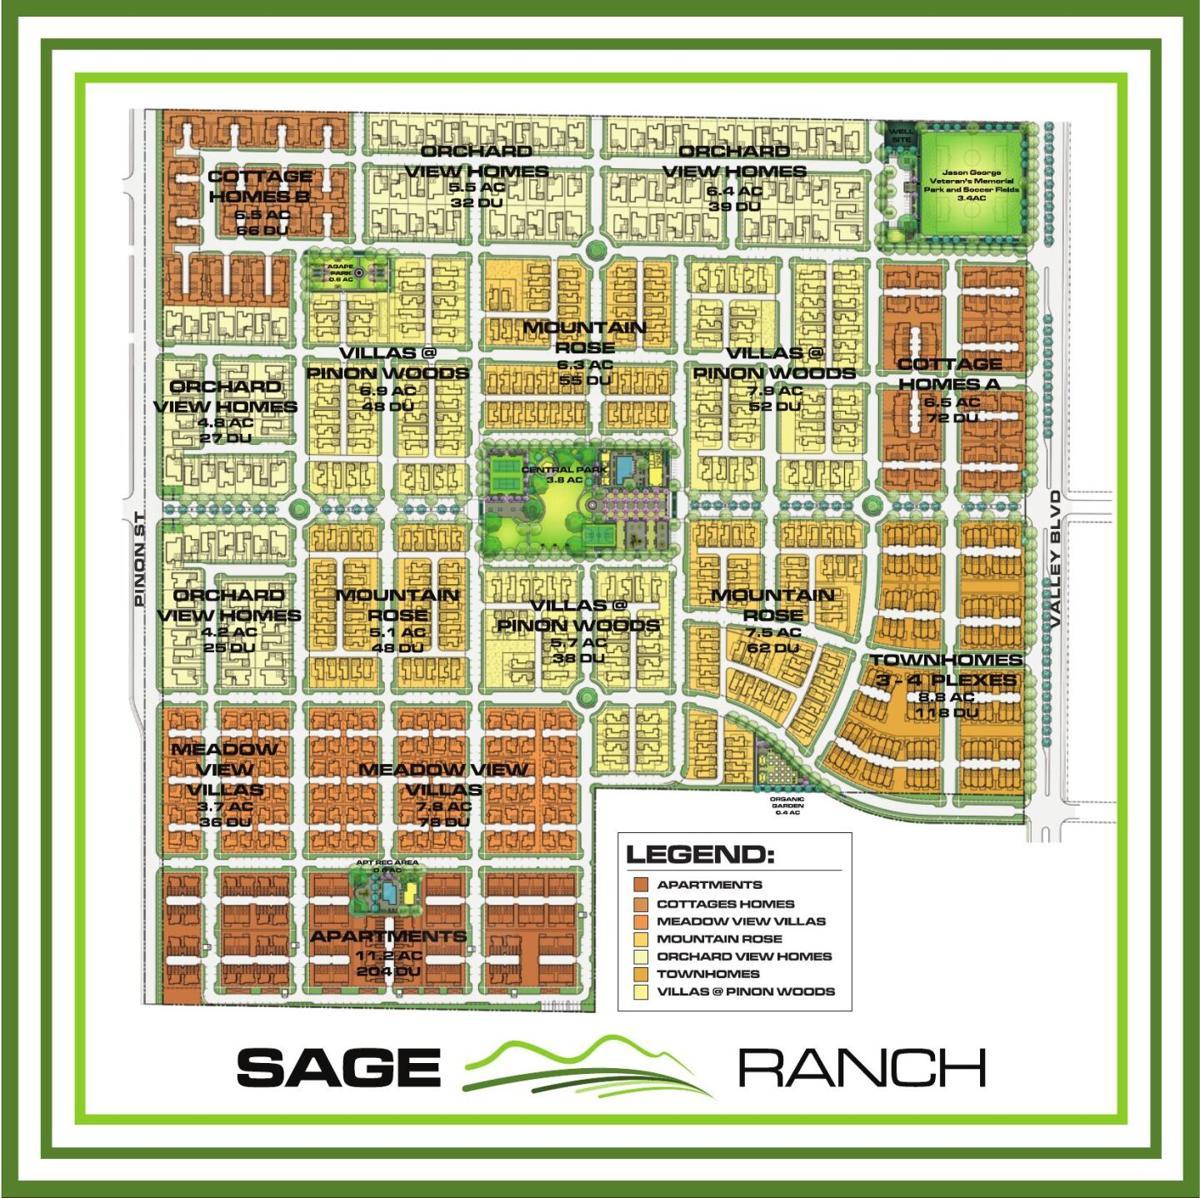 Sage Ranch map